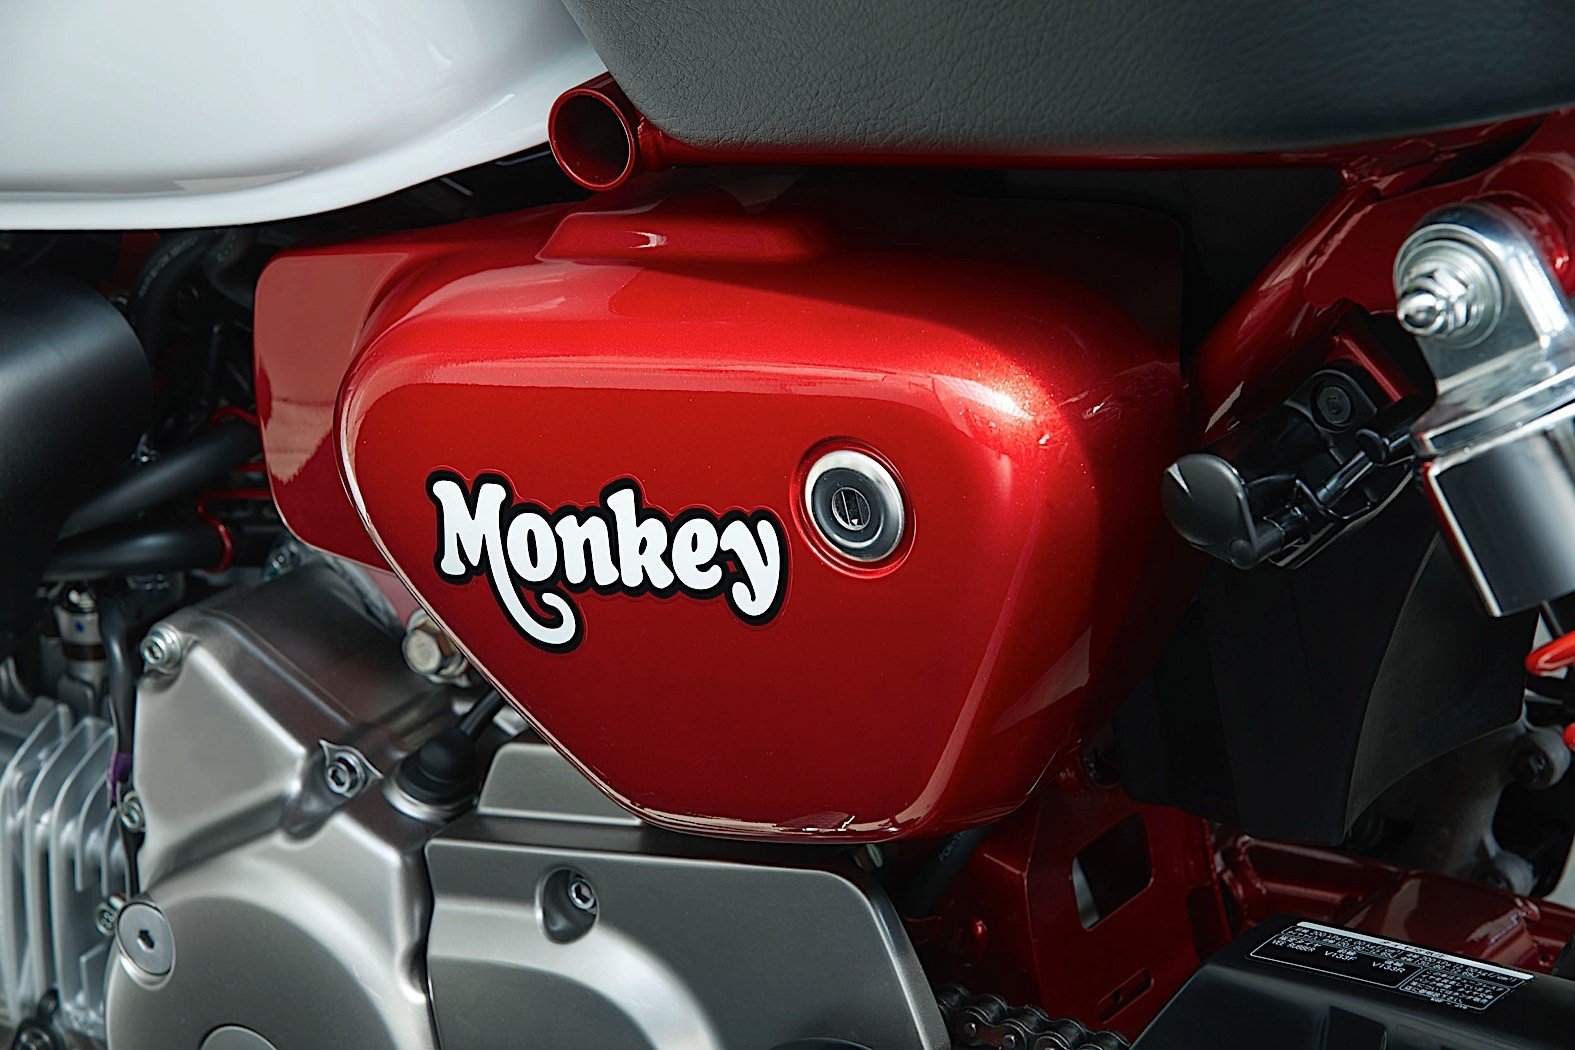 Nick's Monkey Bike | Nick's Skyteam Gorilla Monkey Bike ...